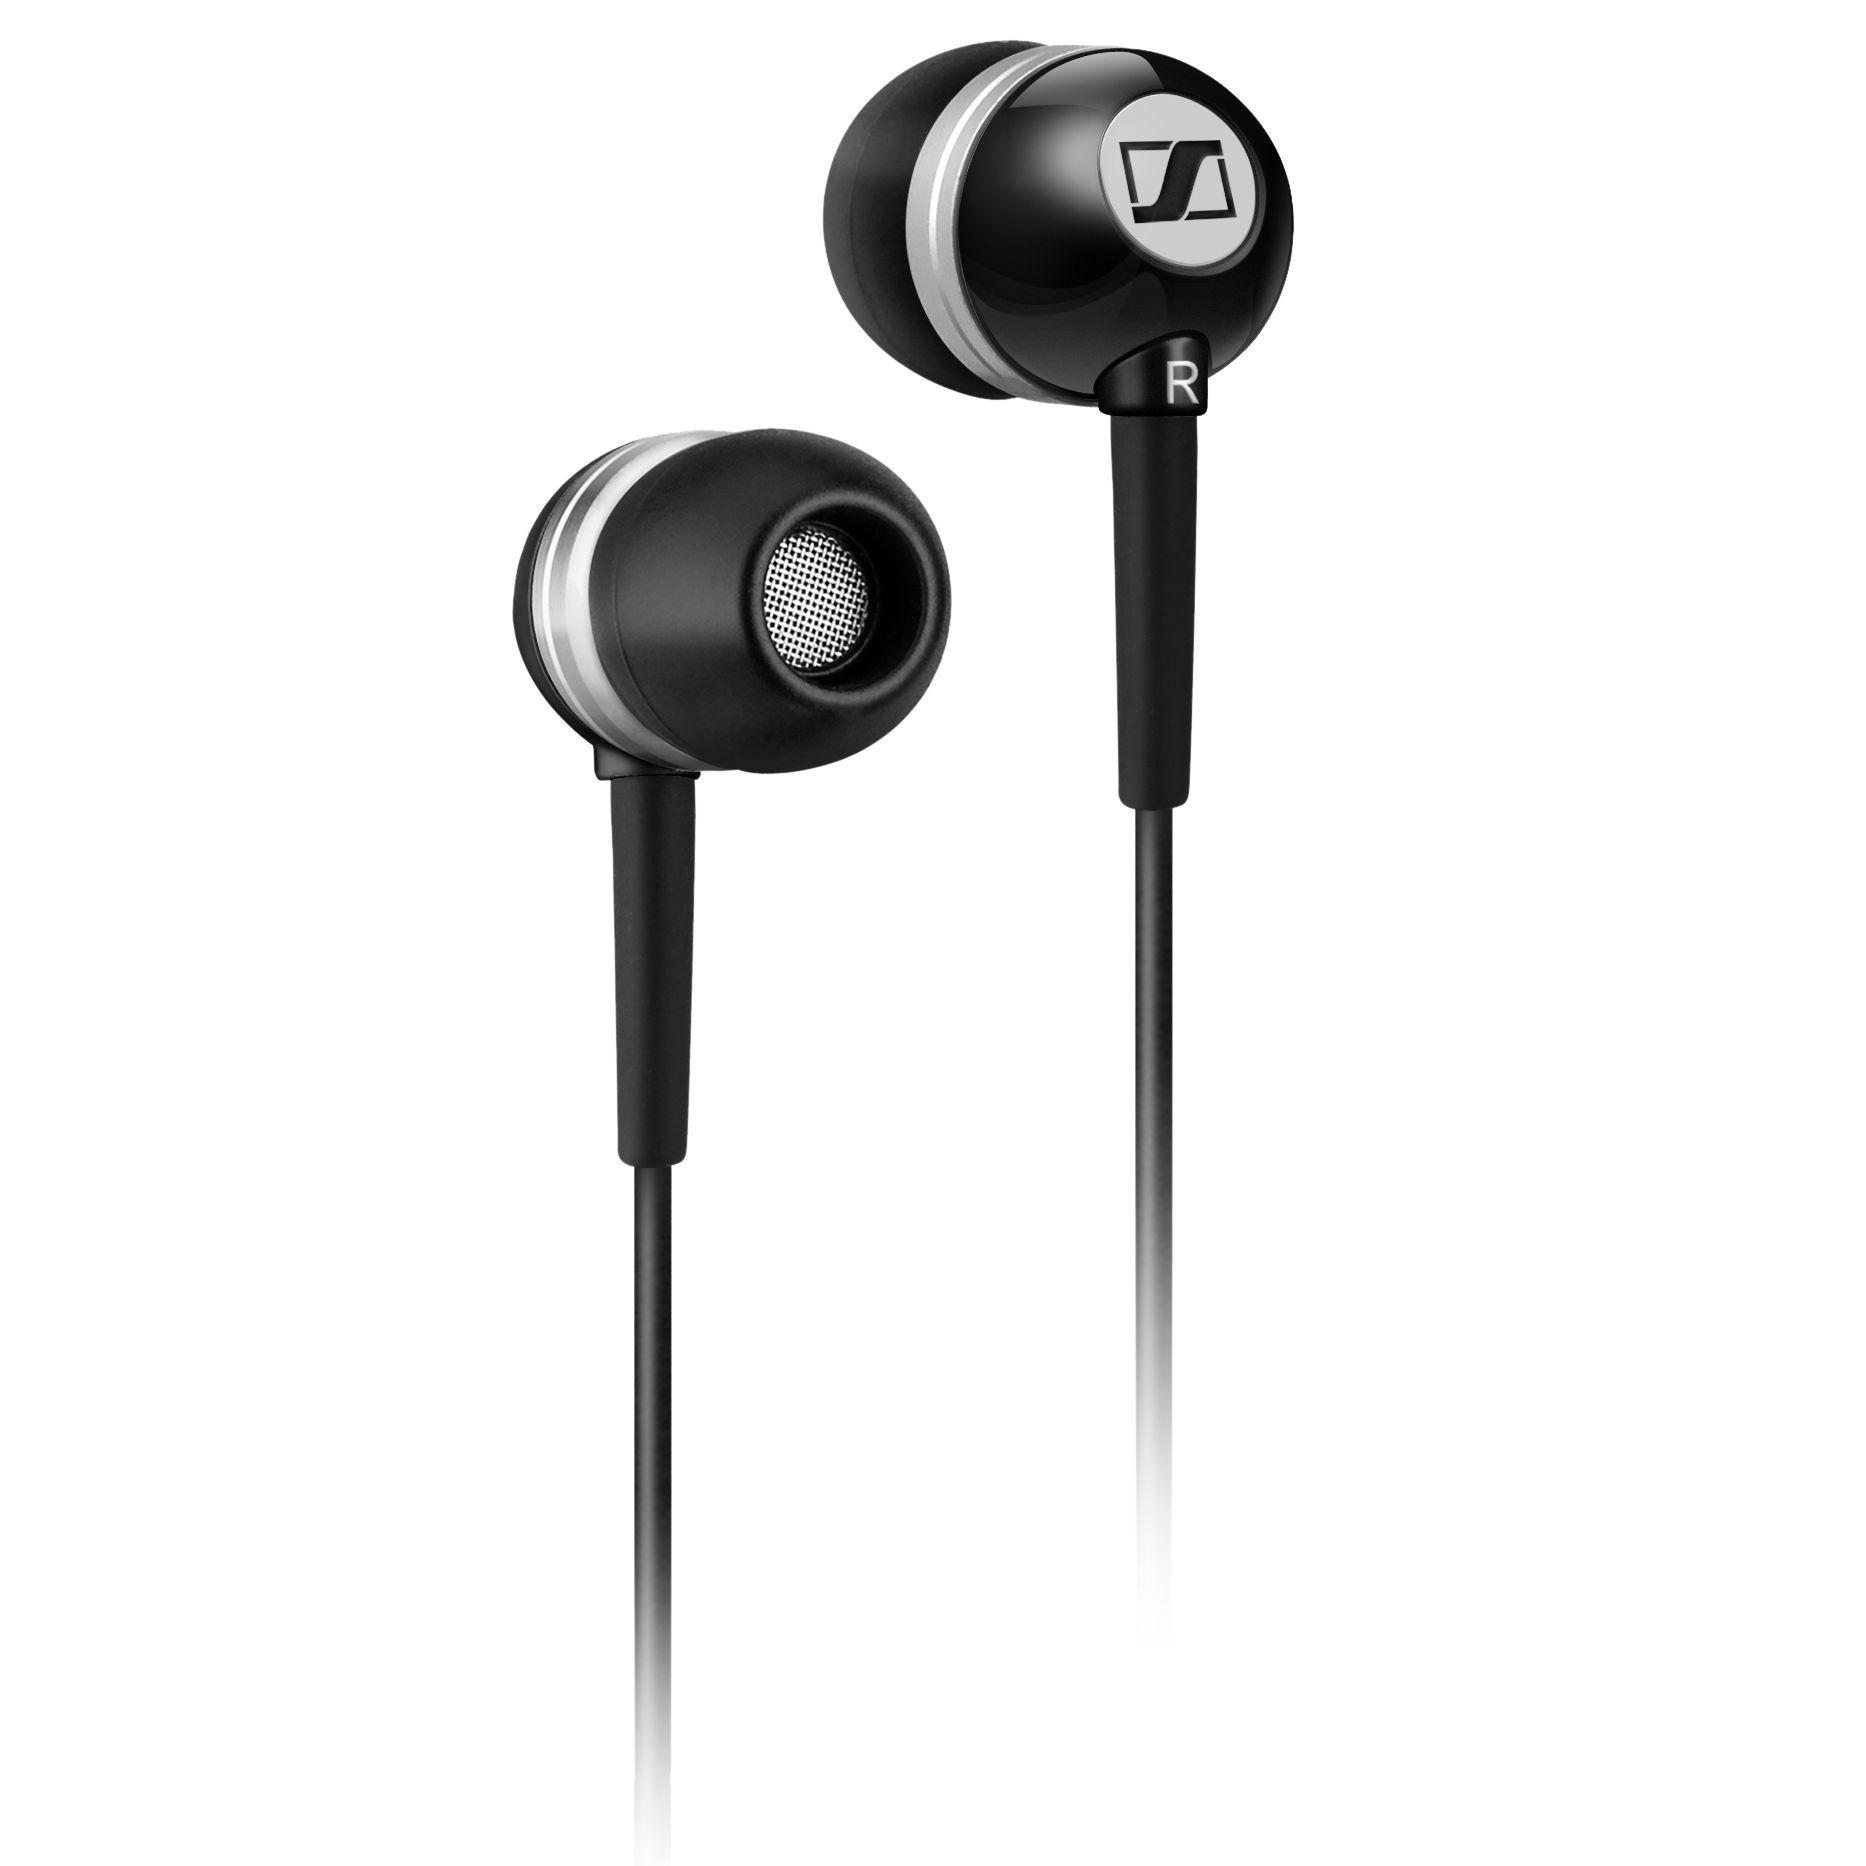 Sennheiser CX-300-II Headphones